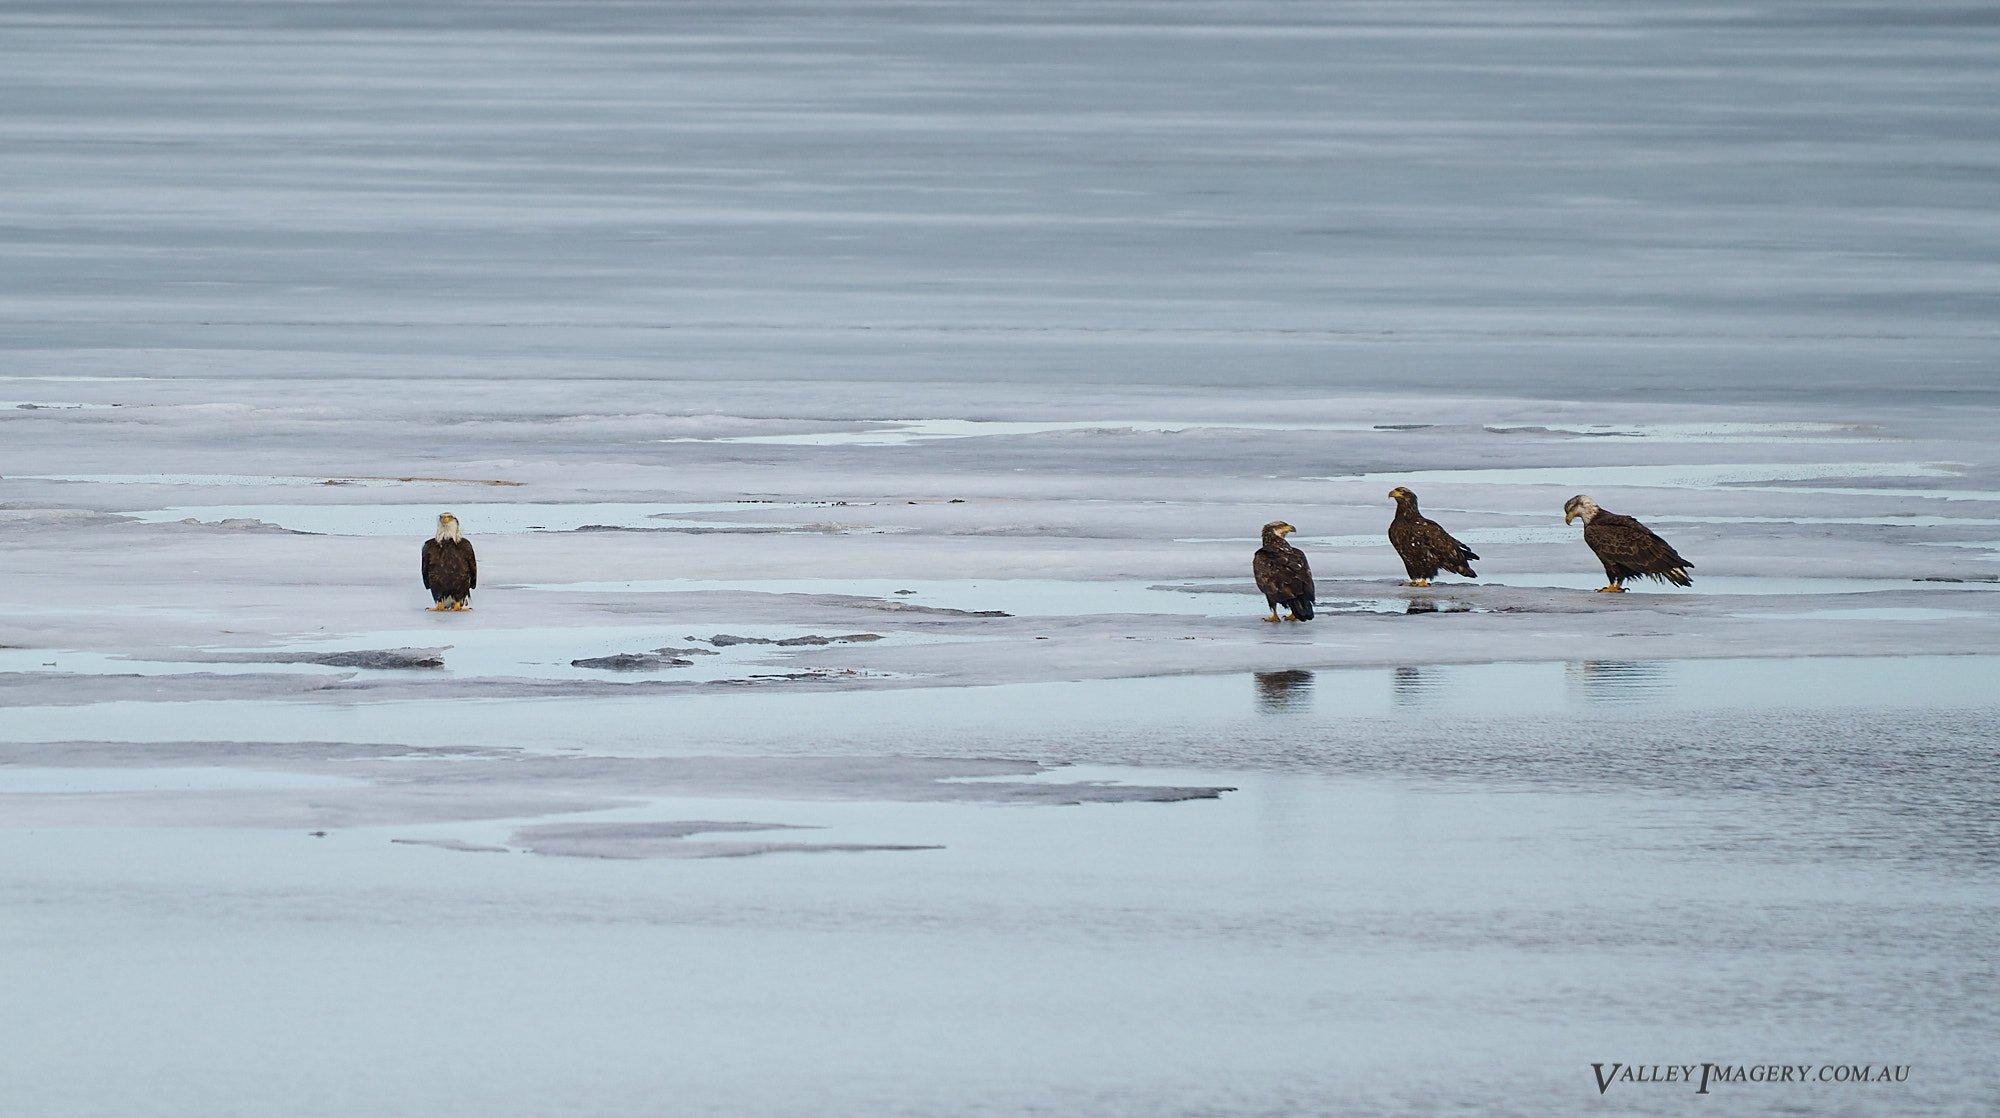 4 Bald eagles on a frozen lake